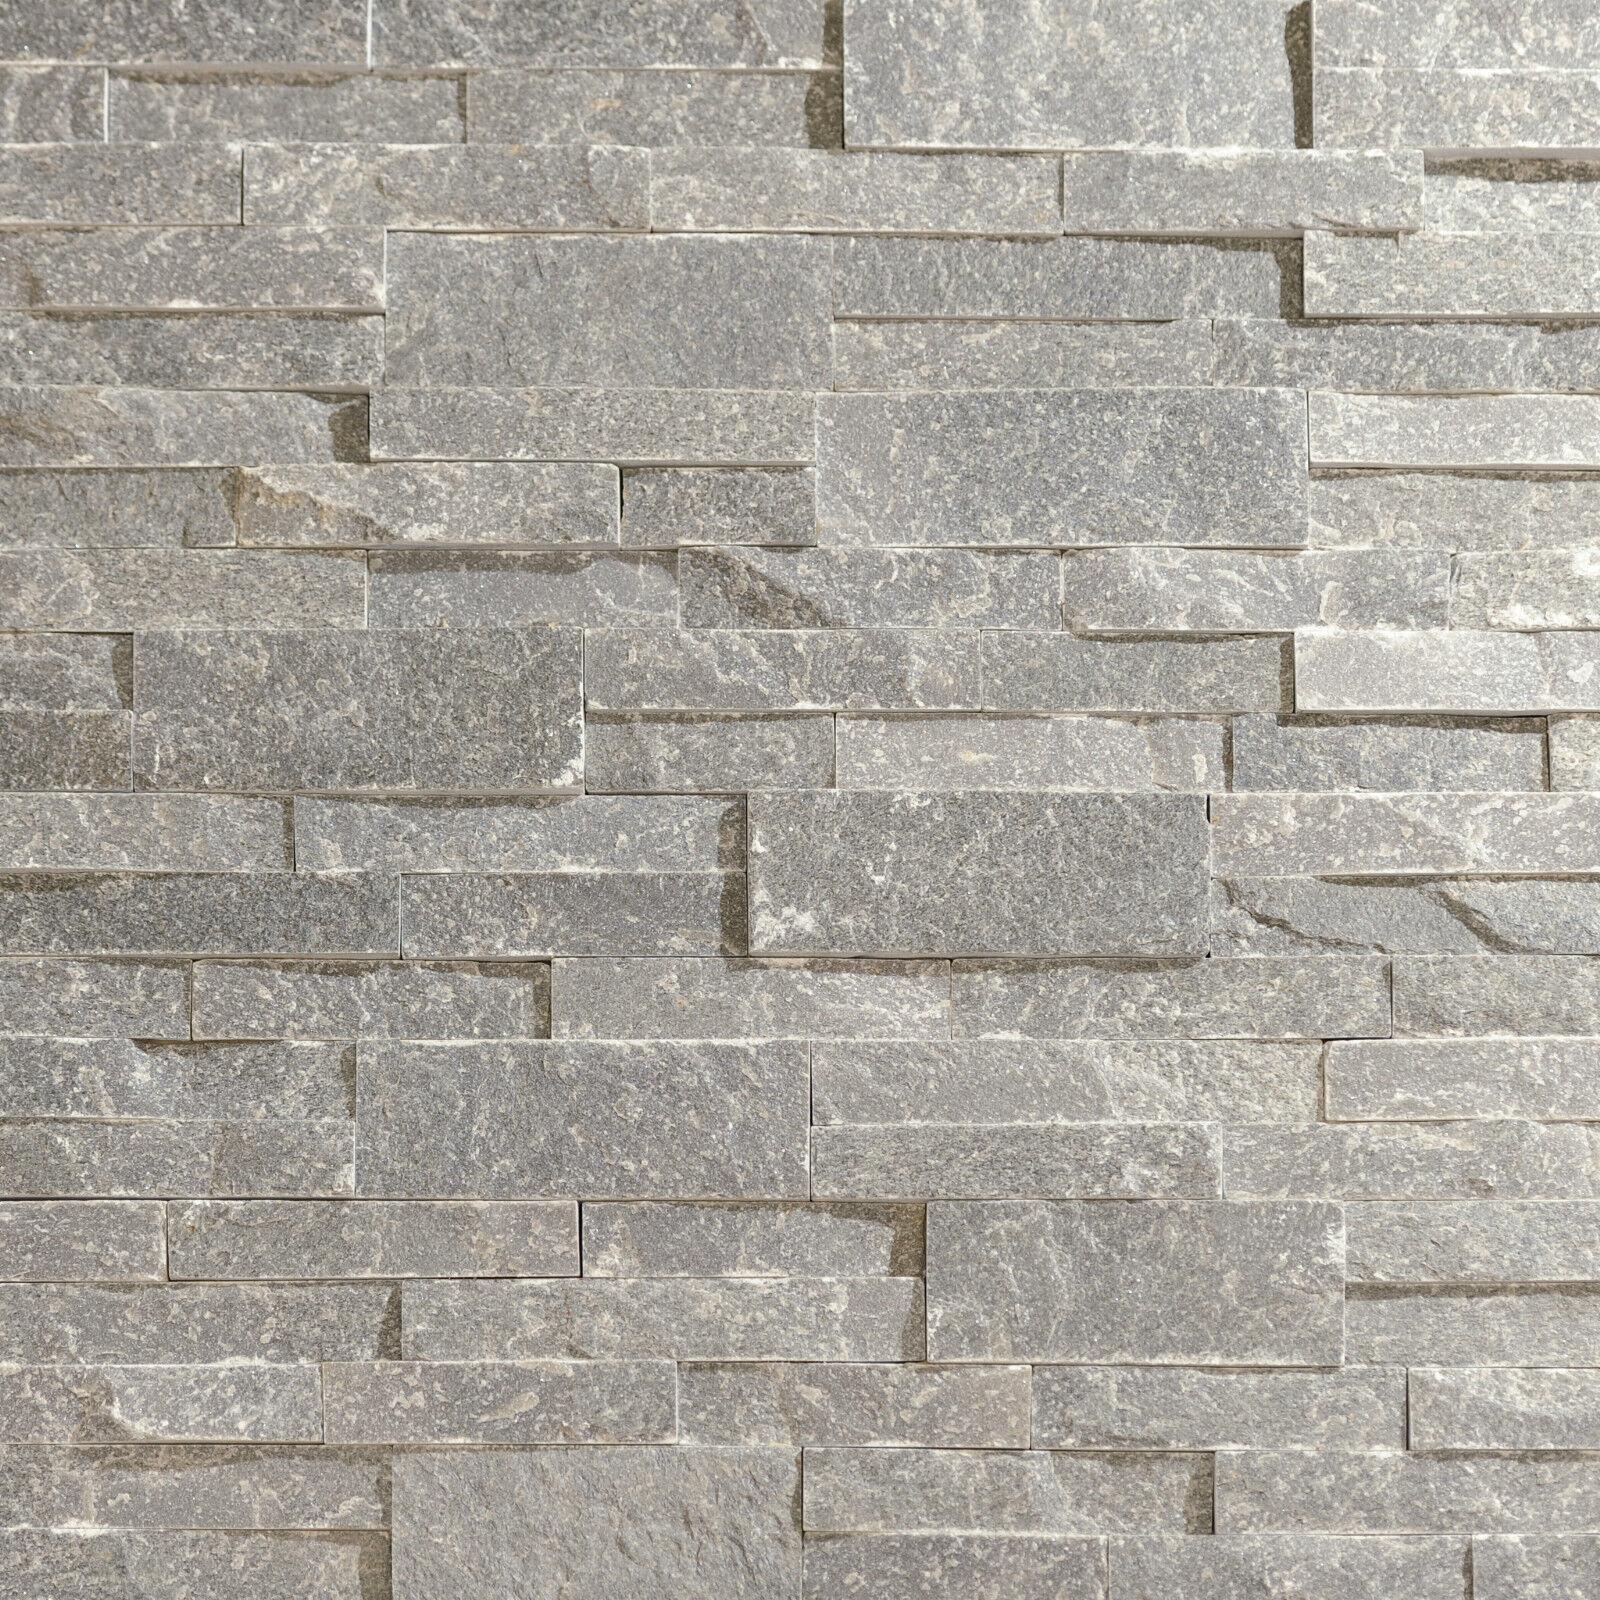 naturstein verblender wandverblender echtstein schiefer bricks grau eur 4 90 picclick de. Black Bedroom Furniture Sets. Home Design Ideas